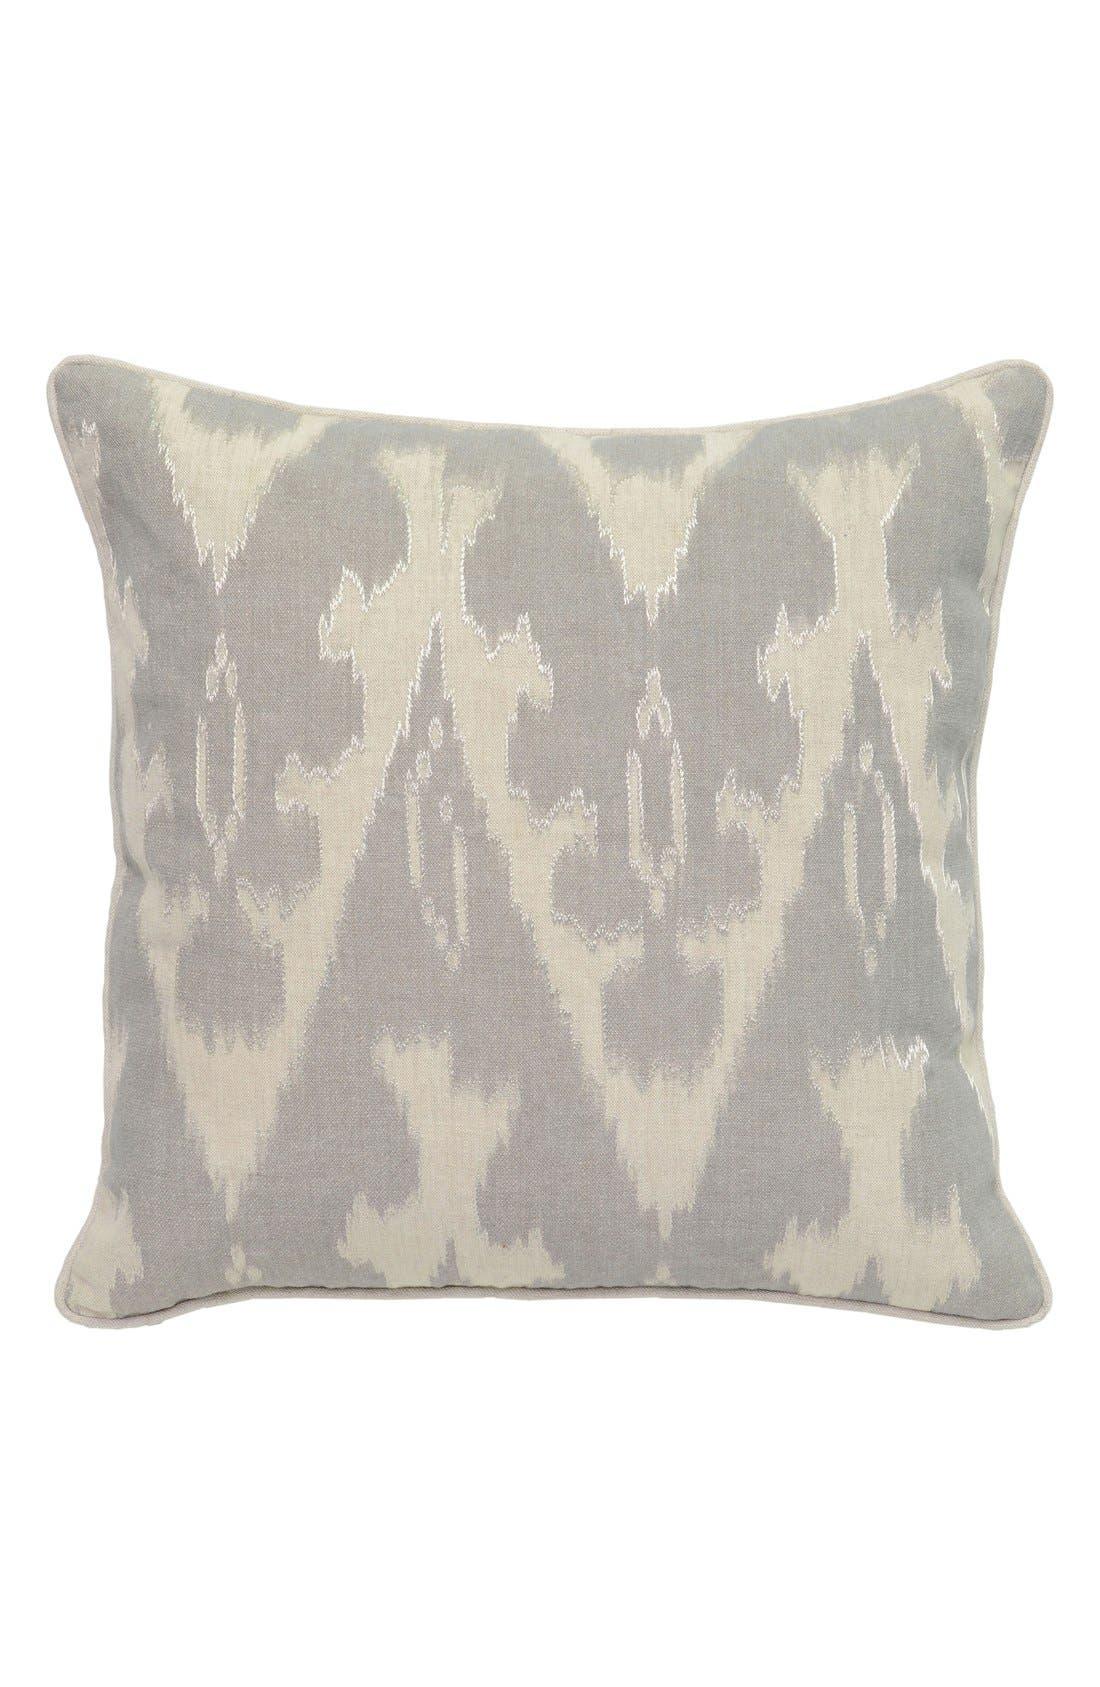 VILLA HOME COLLECTION Fae Accent Pillow, Main, color, 020